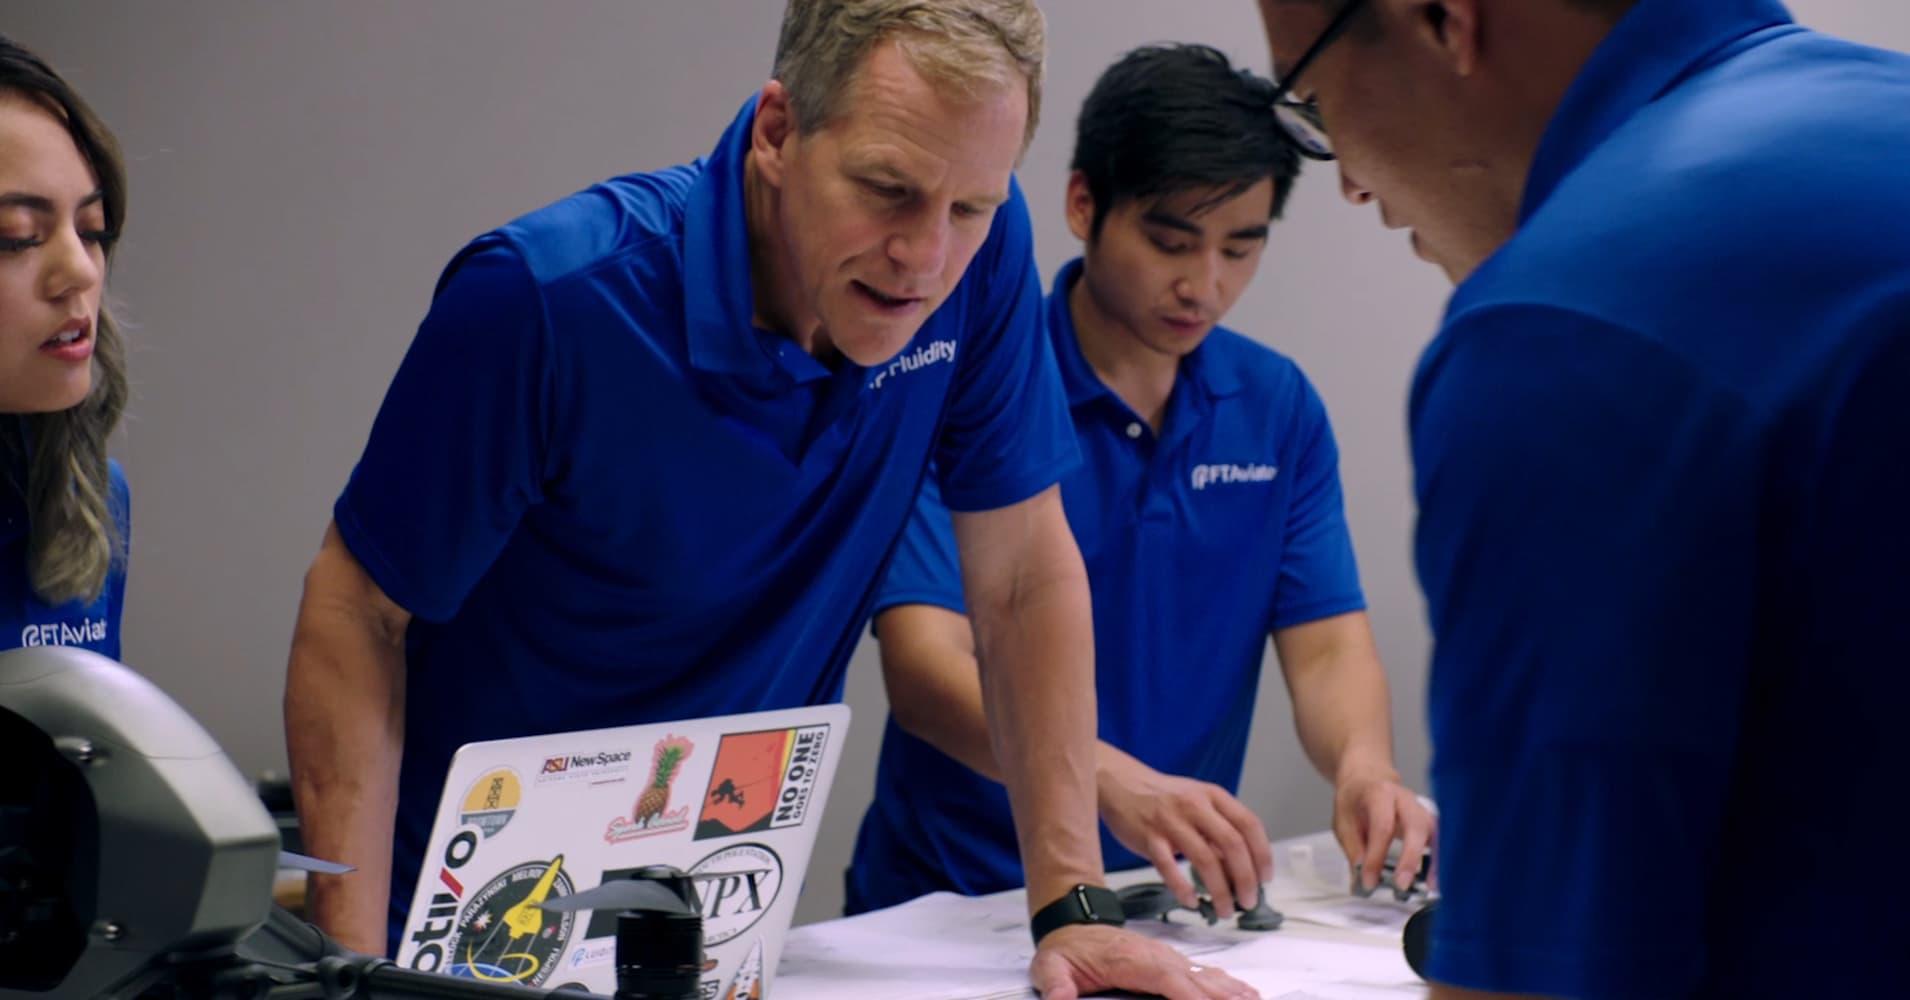 NASA Astronaut Scott Parazynski has a start-up Fluidity Technologies